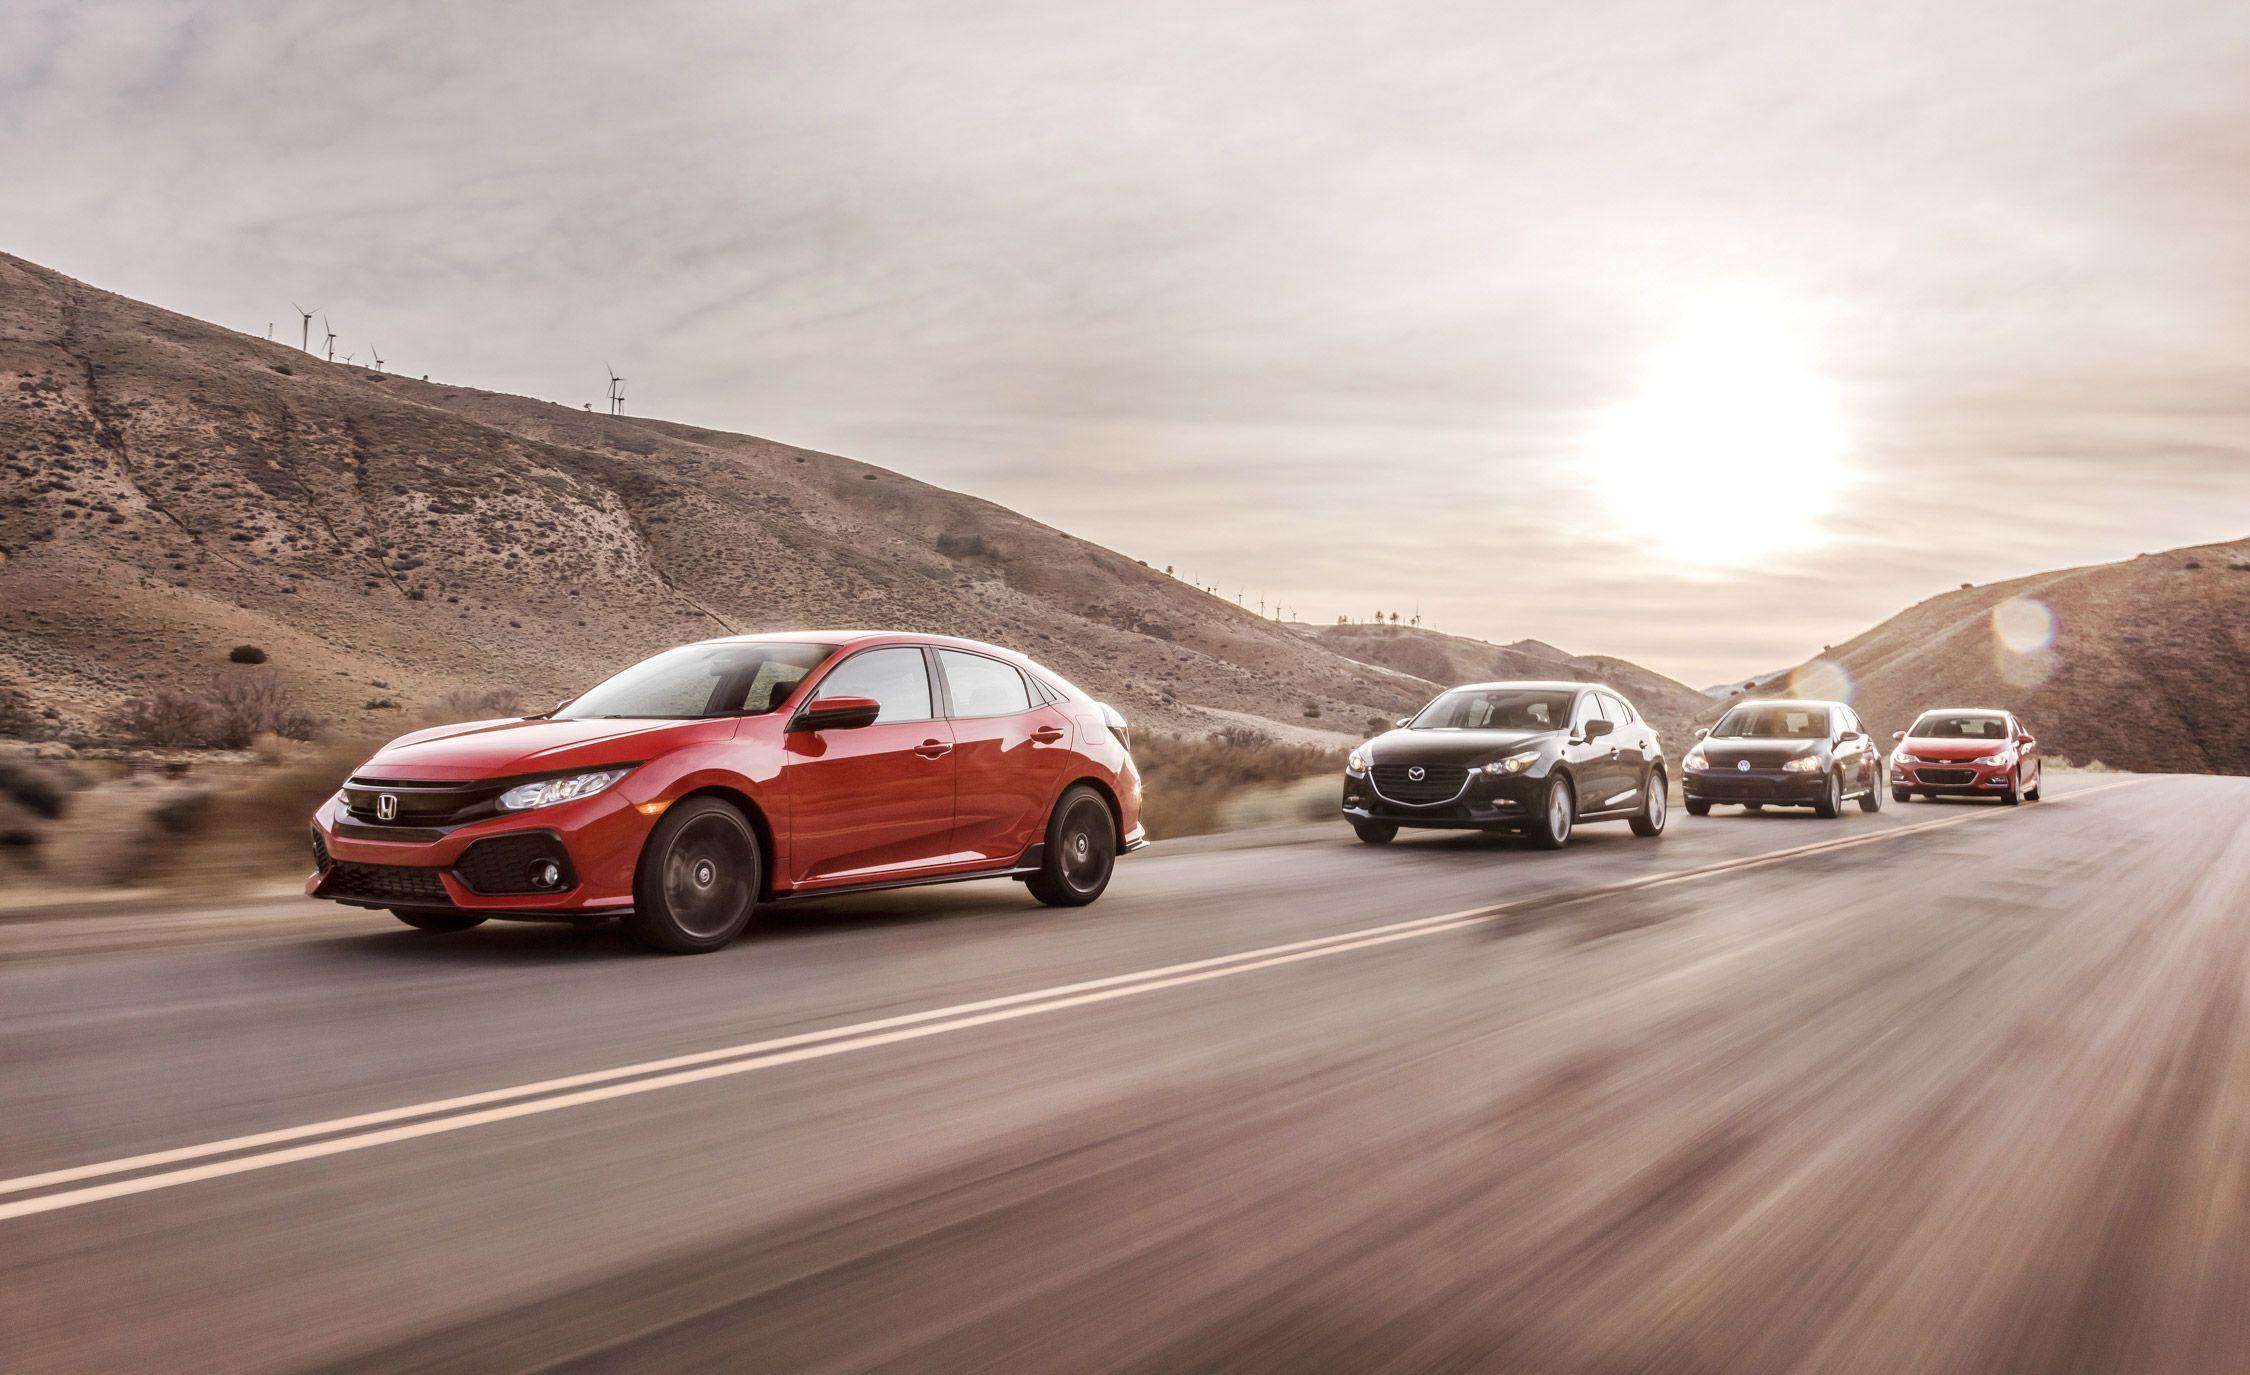 medium resolution of 2017 honda civic hatchback vs chevy cruze mazda 3 vw golfdiagram as well volkswagen